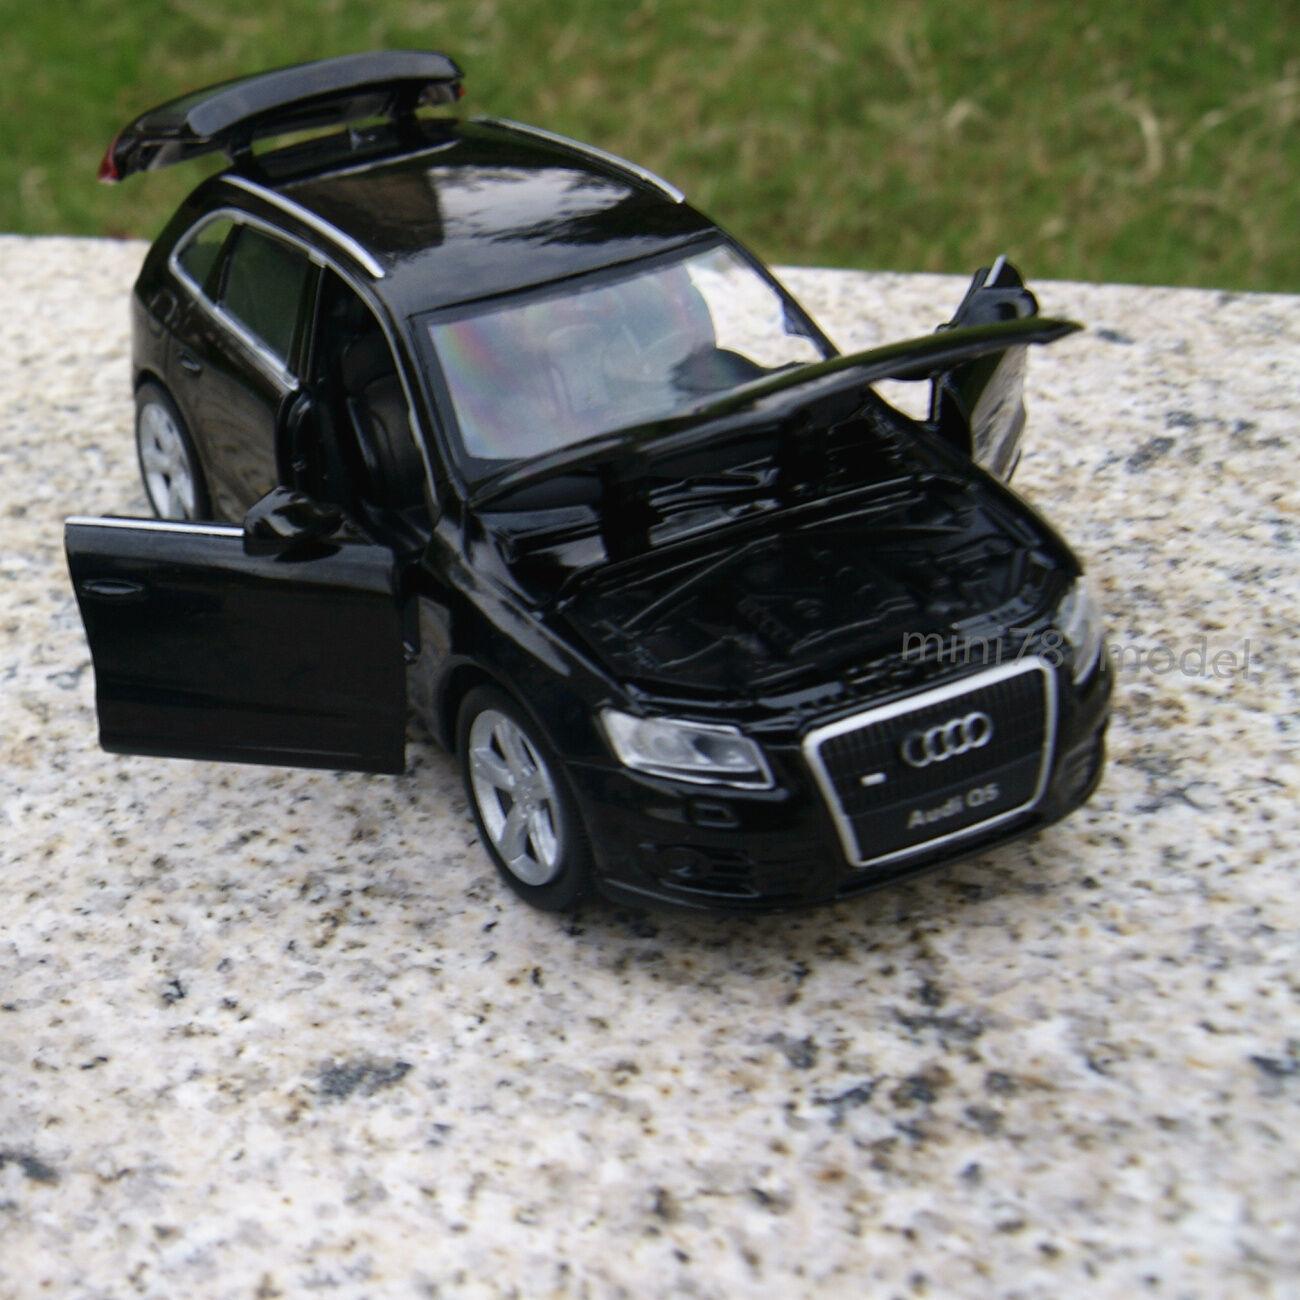 AUDI Q Alloy Diecast Model Cars Soundlight Black Childrens - Audi lowest model price